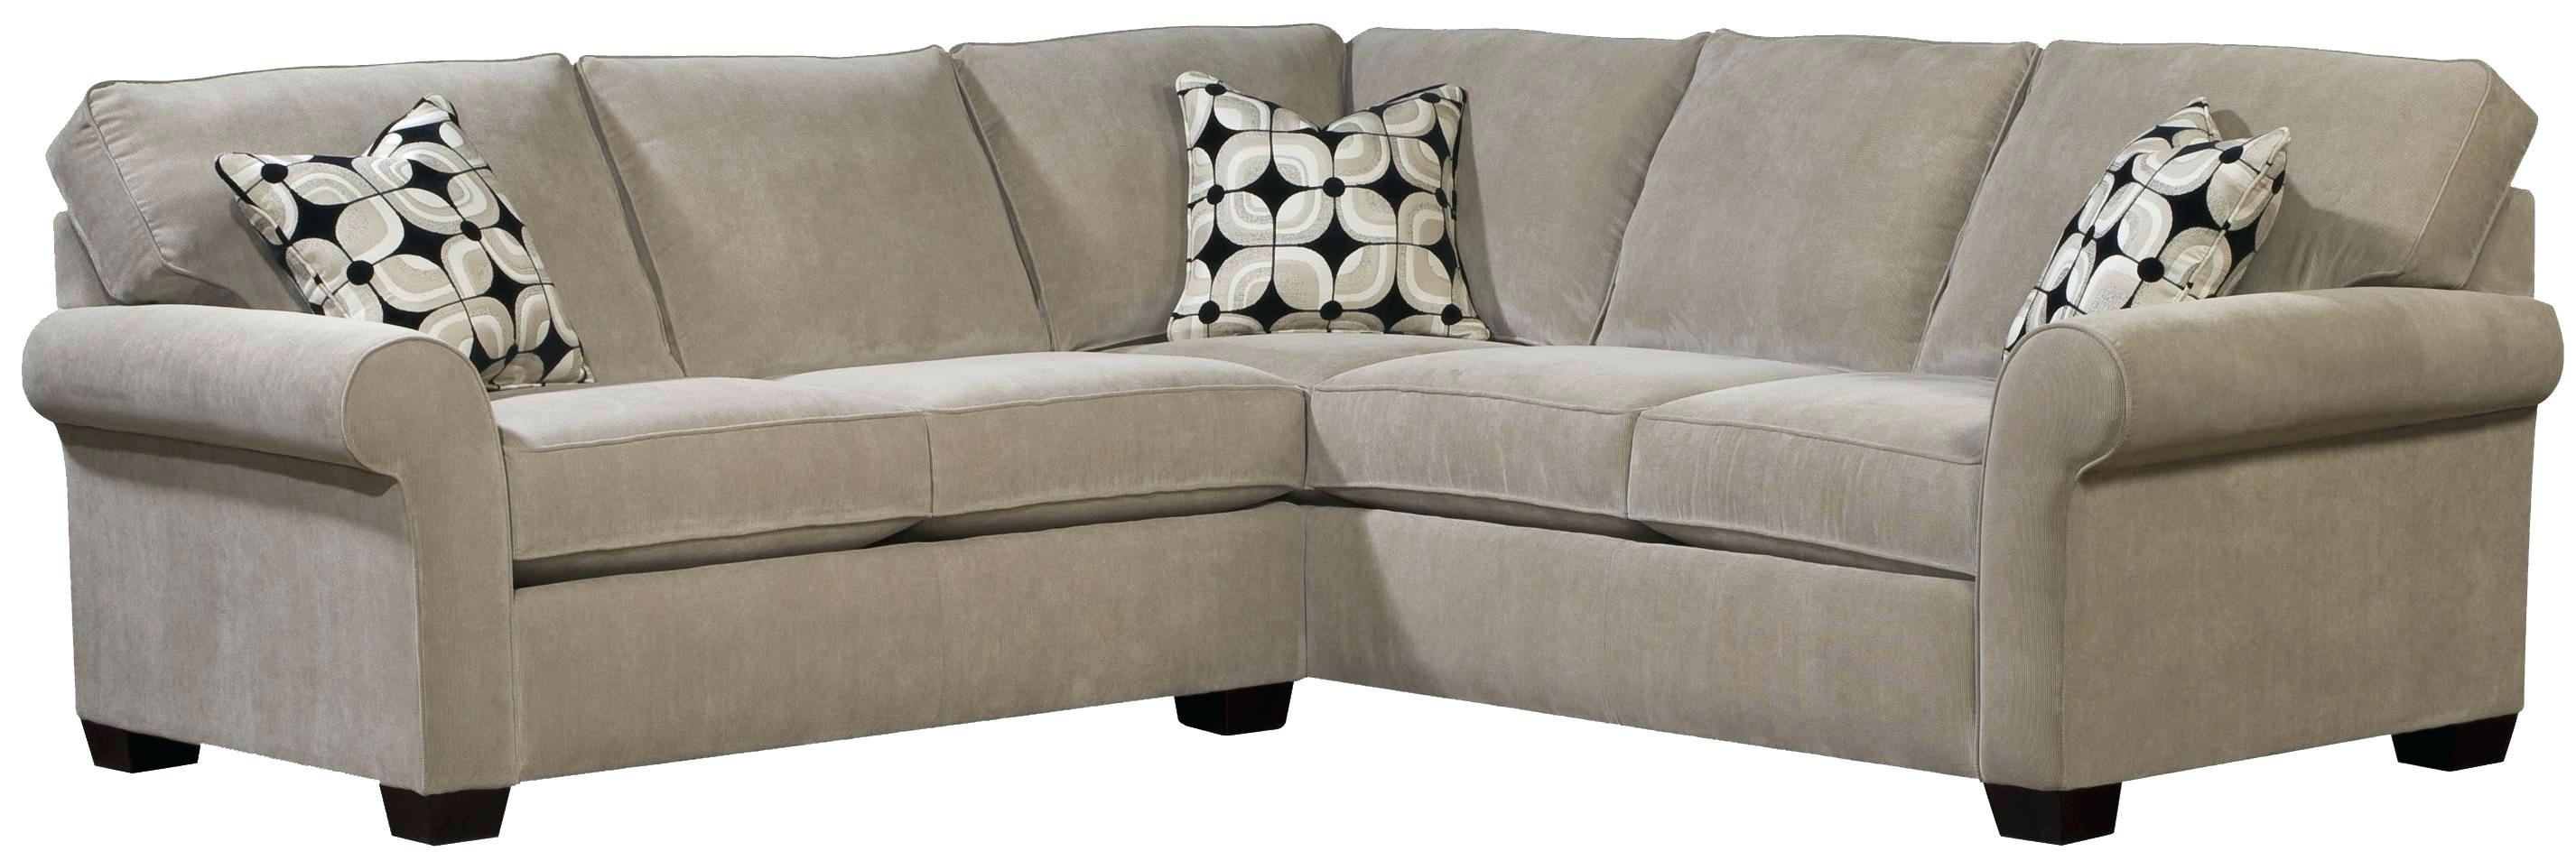 Sam Levitz Furniture Tucson Az Traditional 3 Piece Sectional Sofa Inside Sam Levitz Sectional Sofas (View 8 of 10)